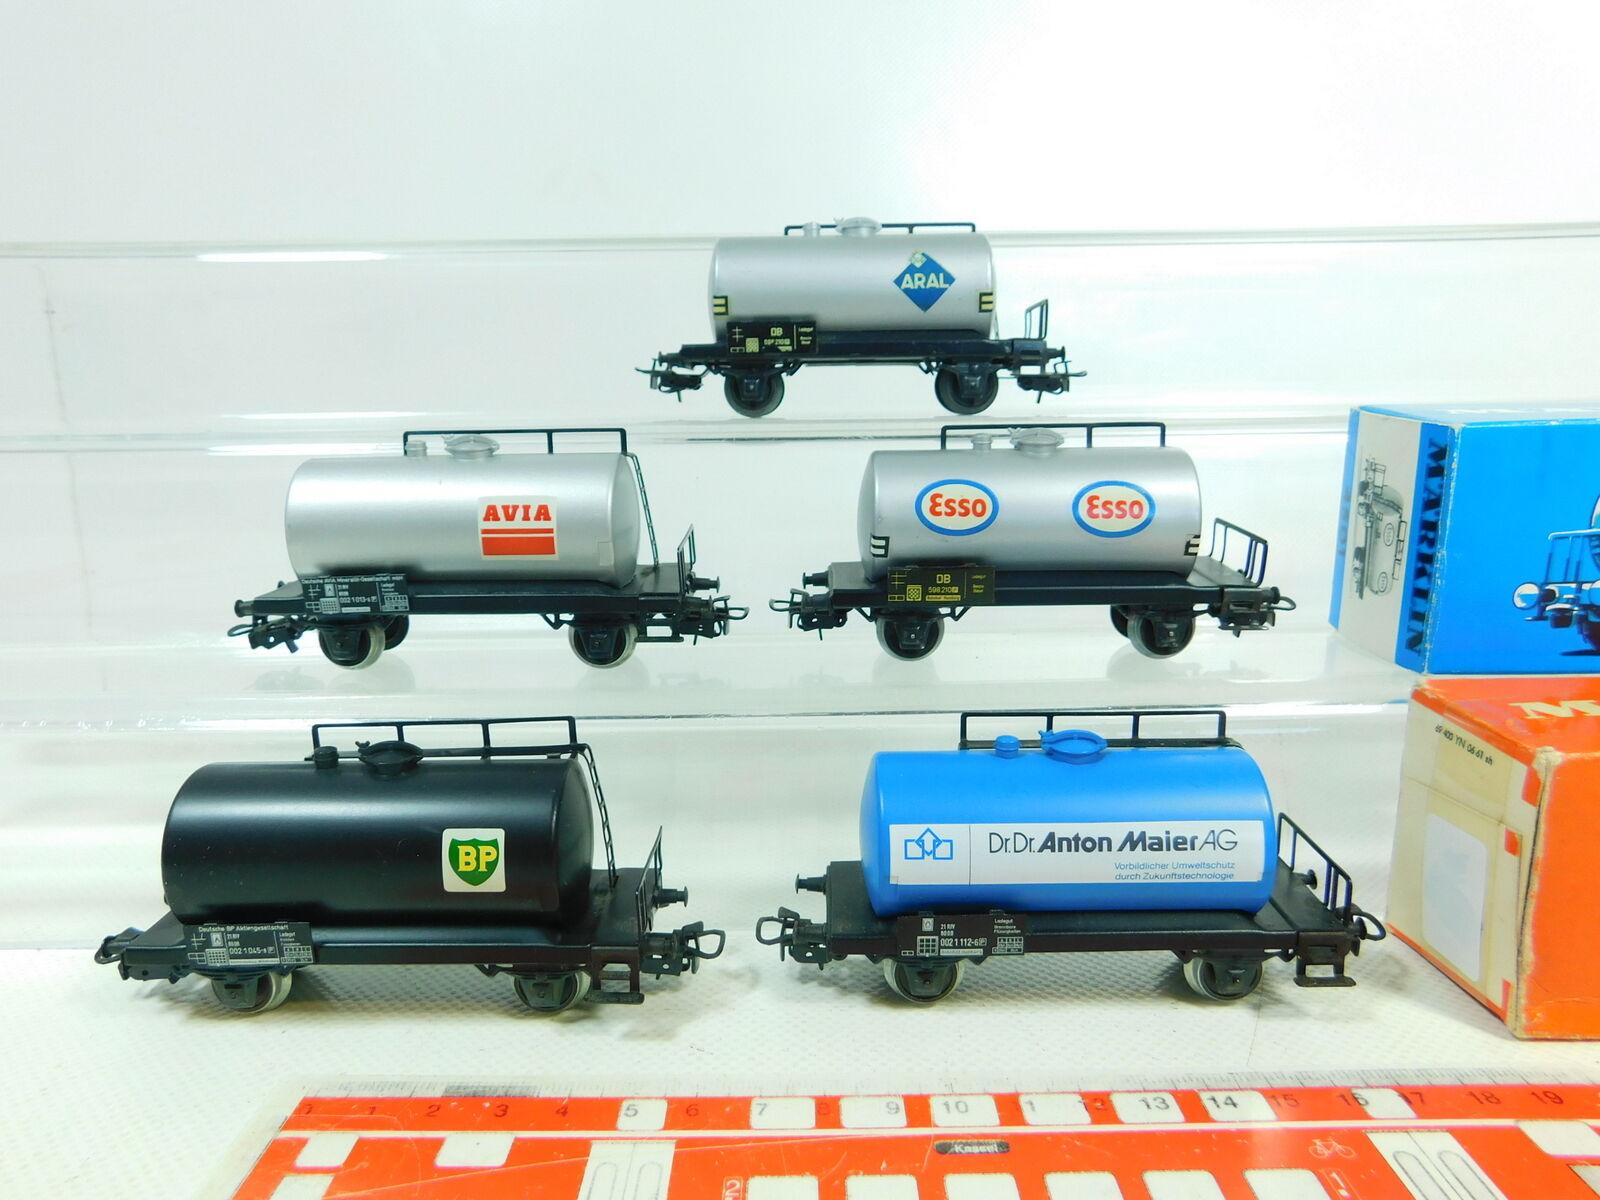 BS799-0,5  5x   H0/Ac Vagone Cisterna Avia,Aral,Bp Etc. 4500,4501; 2x Ovp